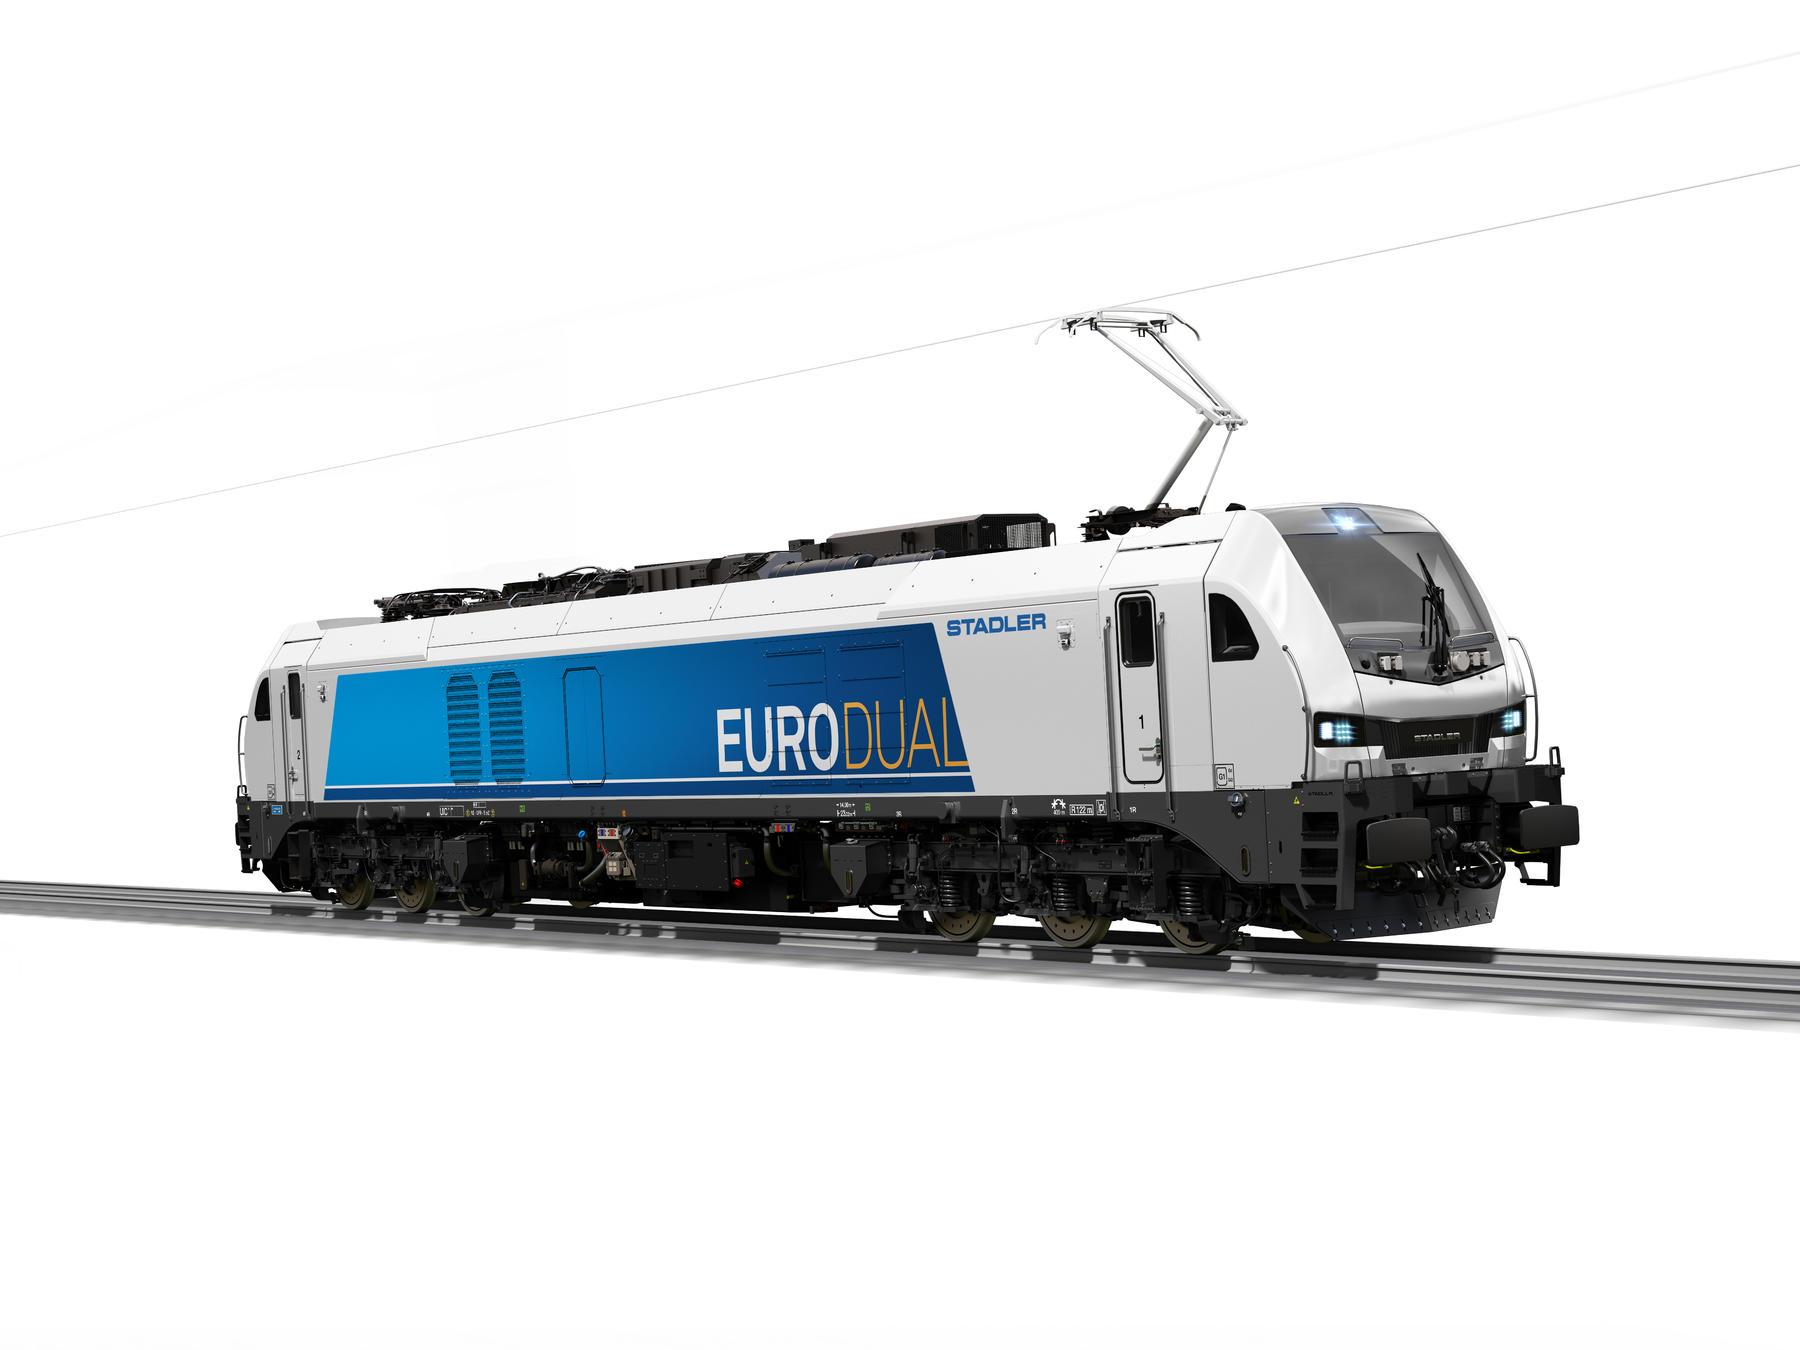 Turkey: Stadler Wins EURODUAL Locomotives Contract